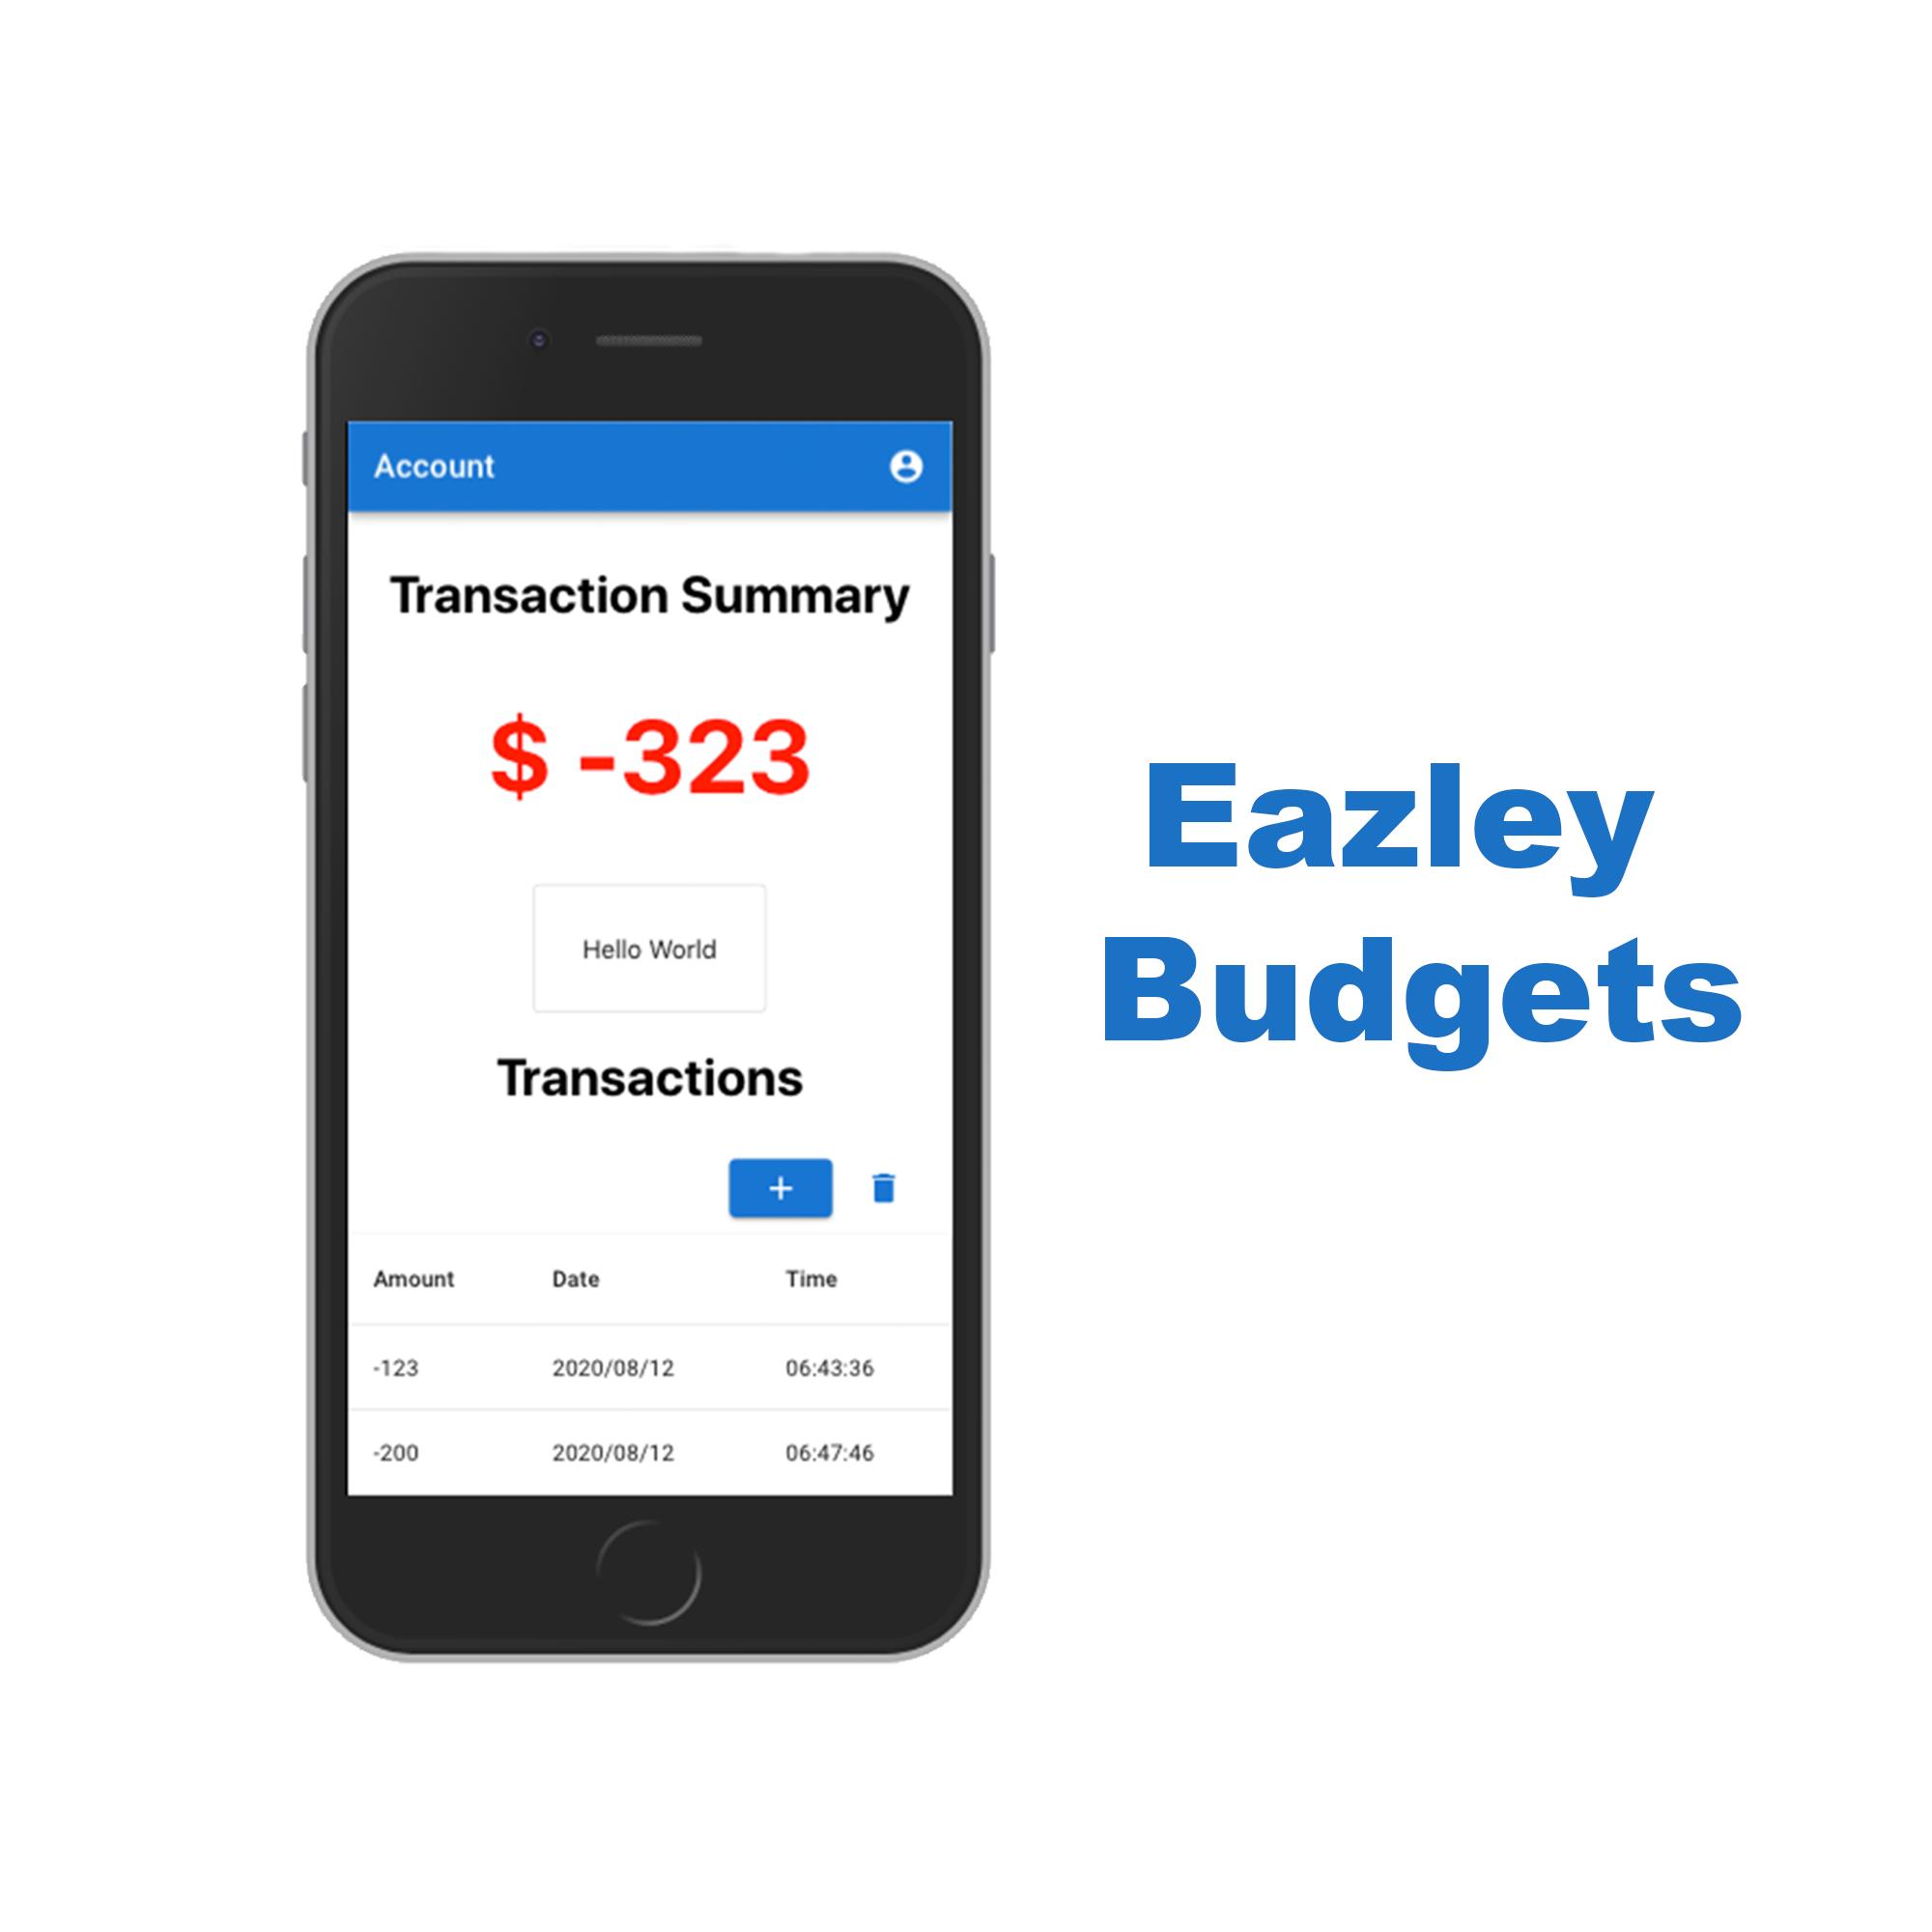 Eazley Budgets